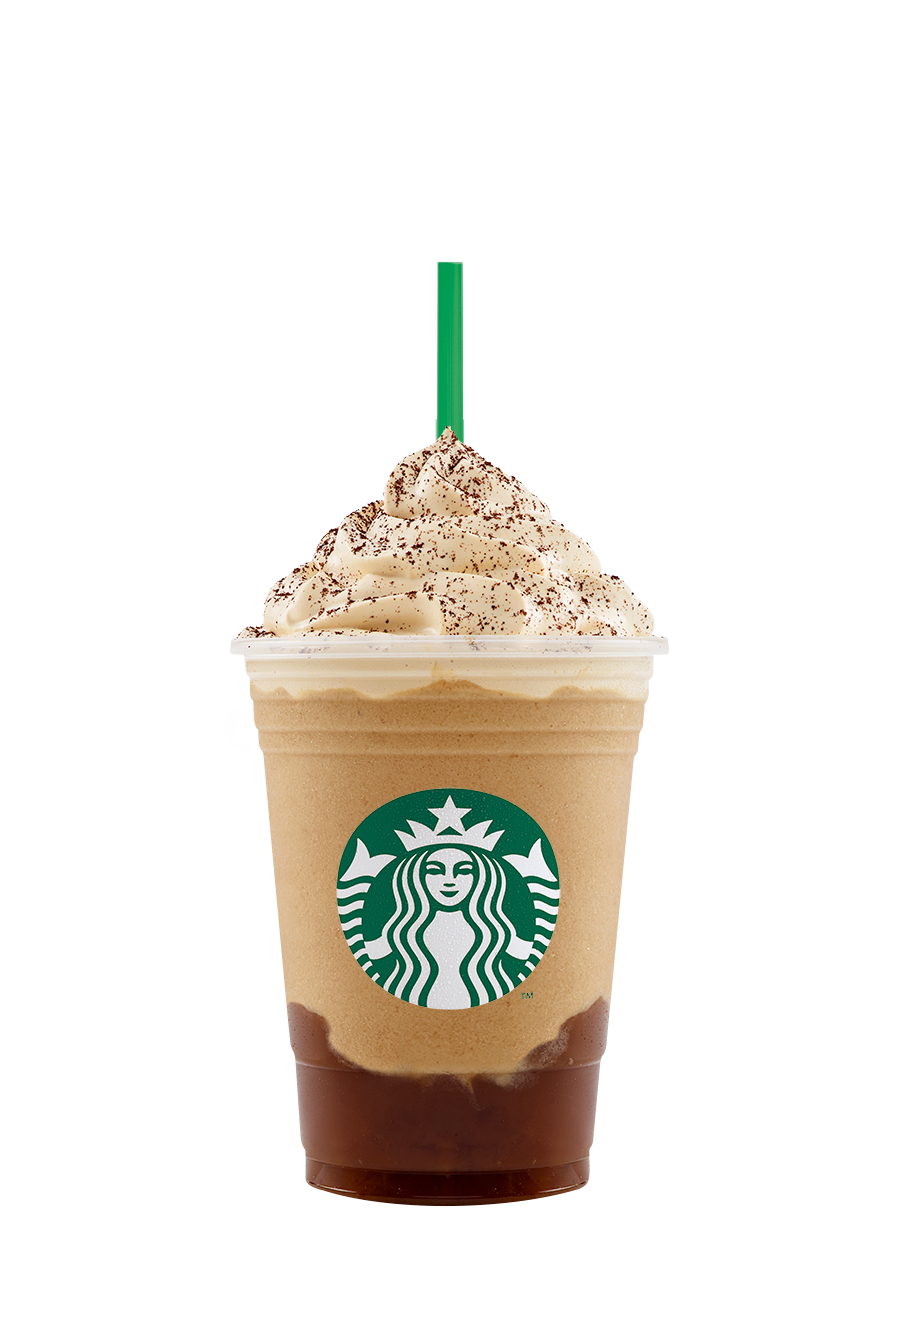 New Starbucks Frappuccino Blended Beverage: Irish Cream Coffee Pudding